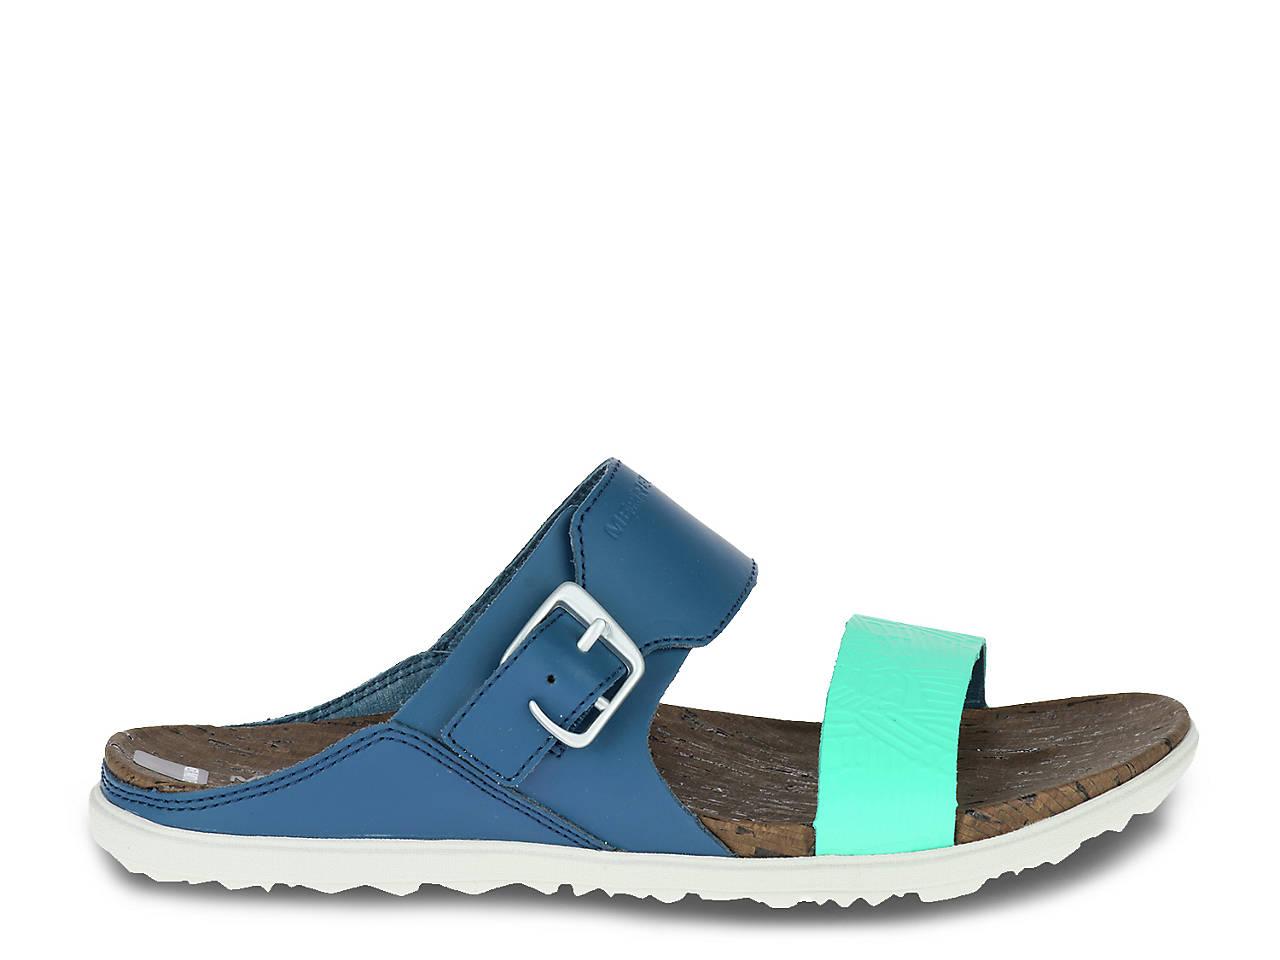 933d10aea3be Merrell Around Town Buckle Slide Sandal Women s Shoes